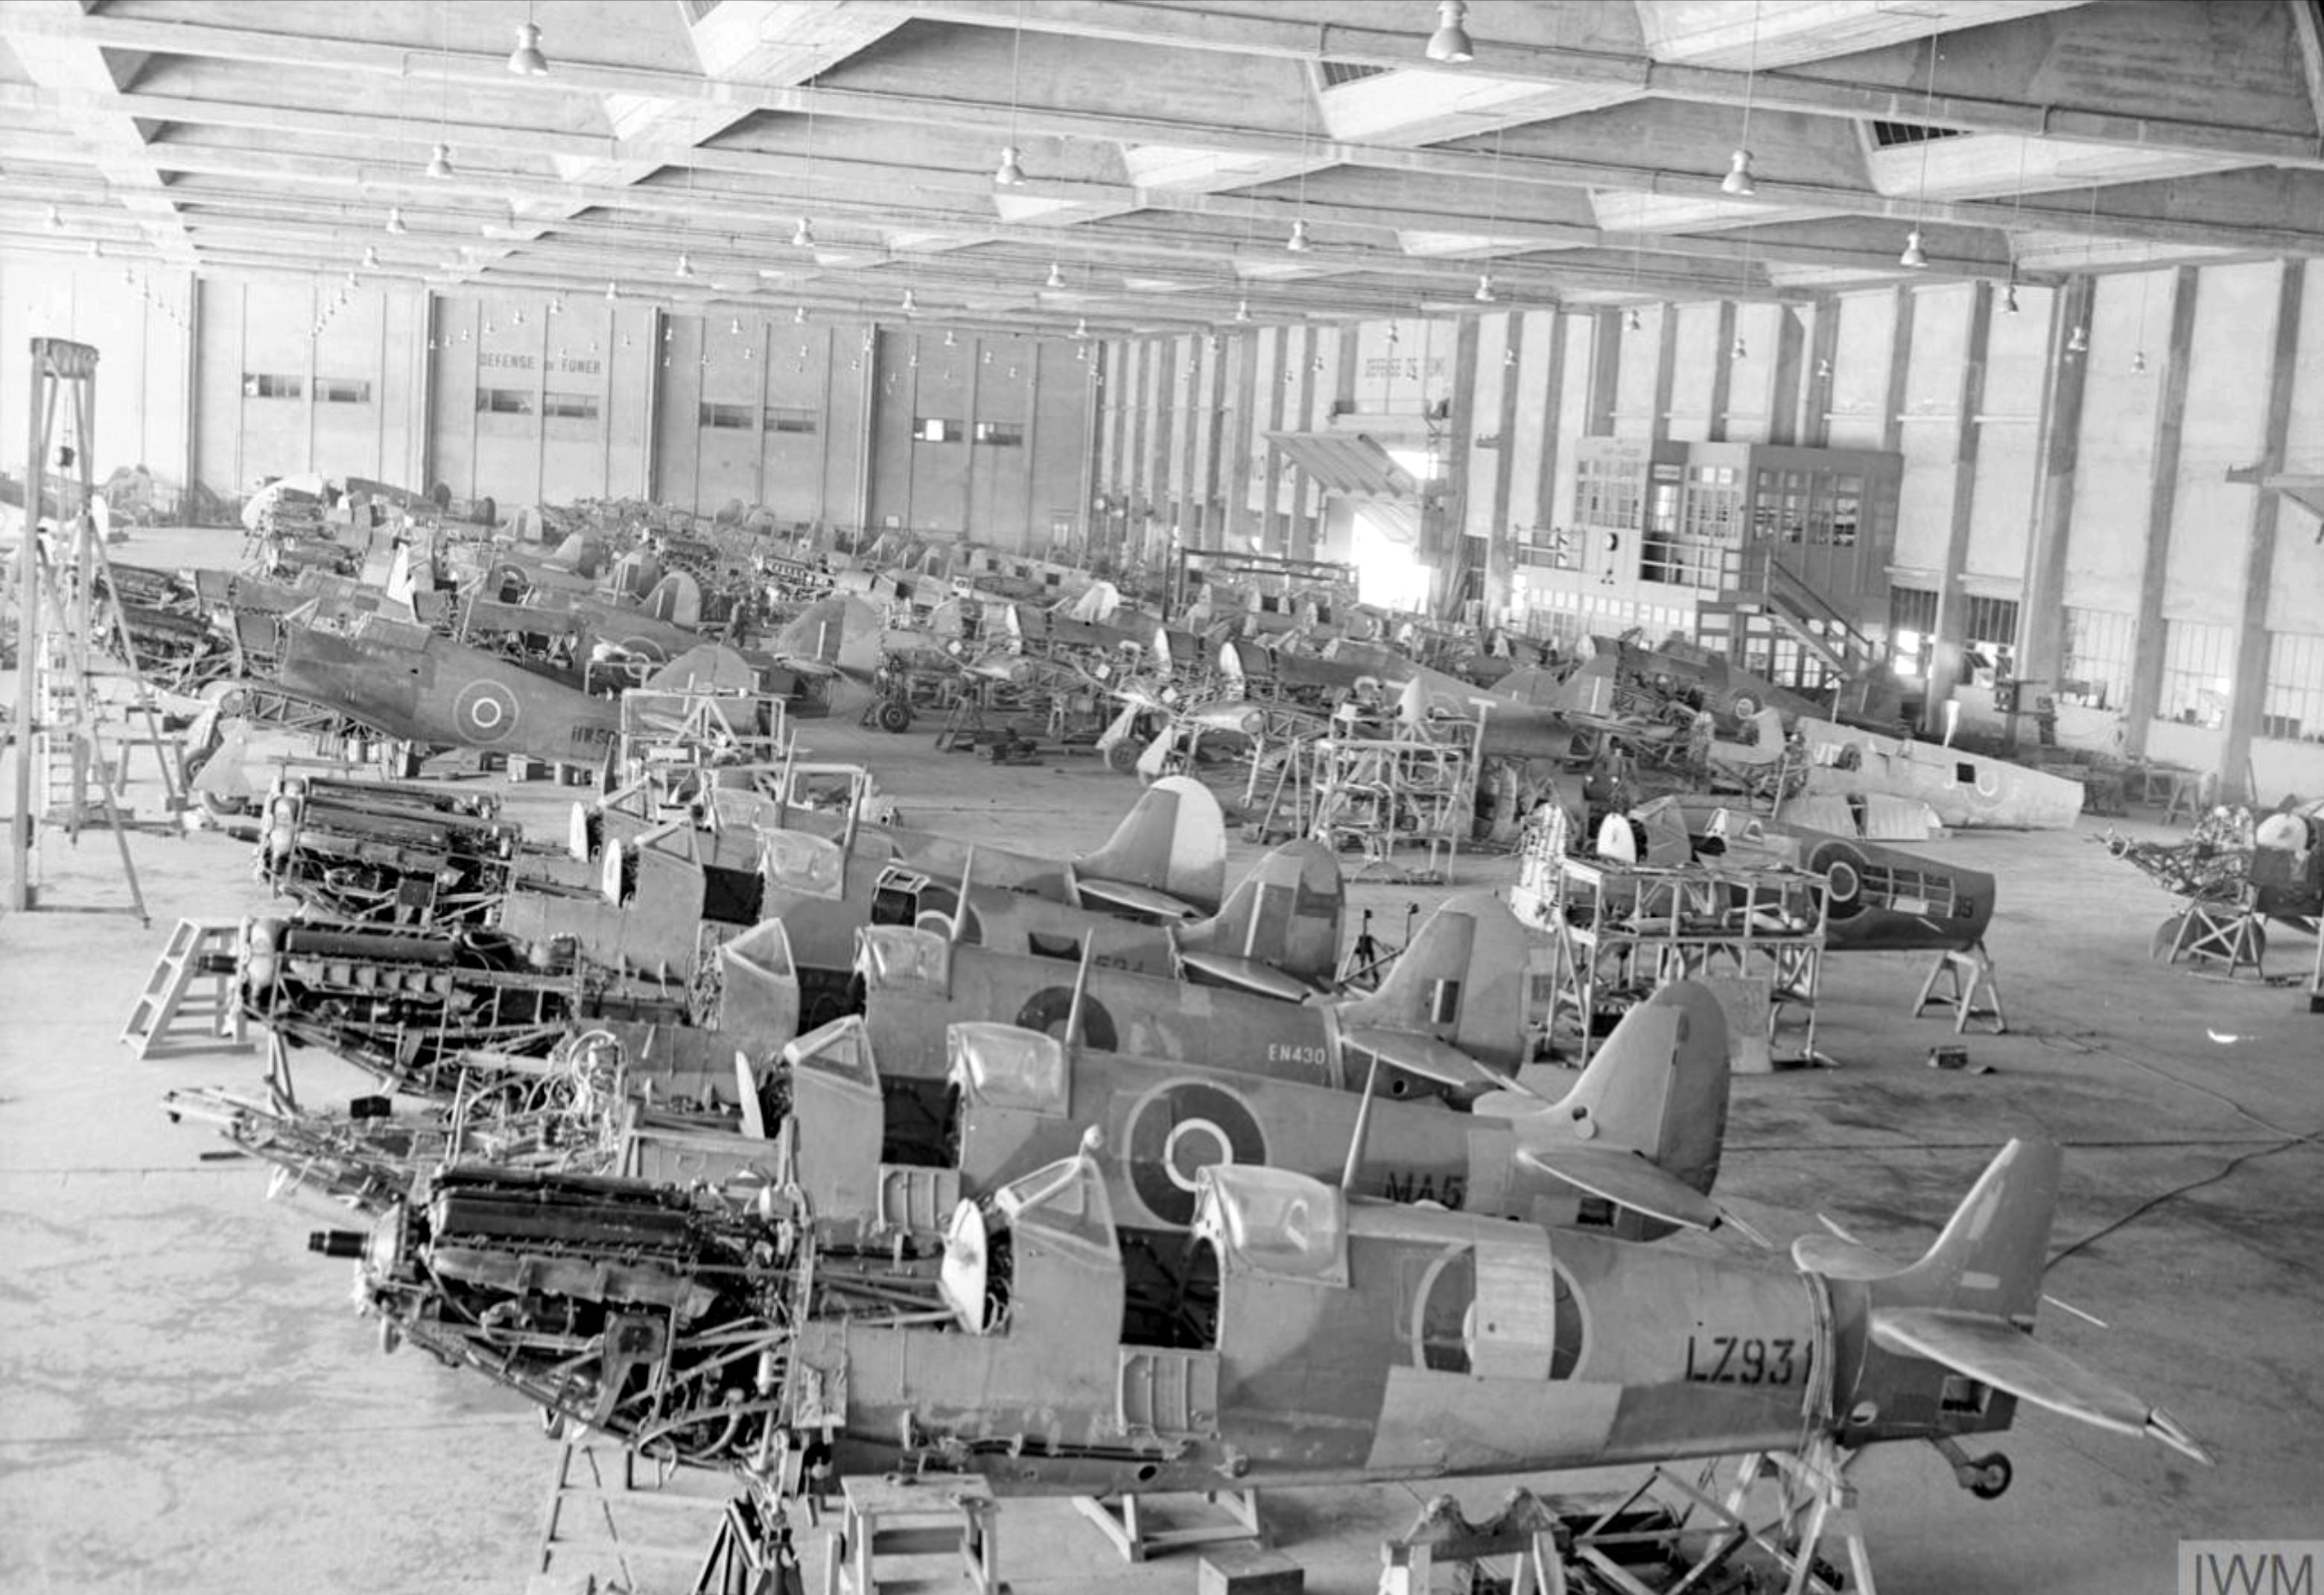 MU Spitfires RAF 144 Maintenance Unit at Maison Blanche Algeria IWM CNA2243